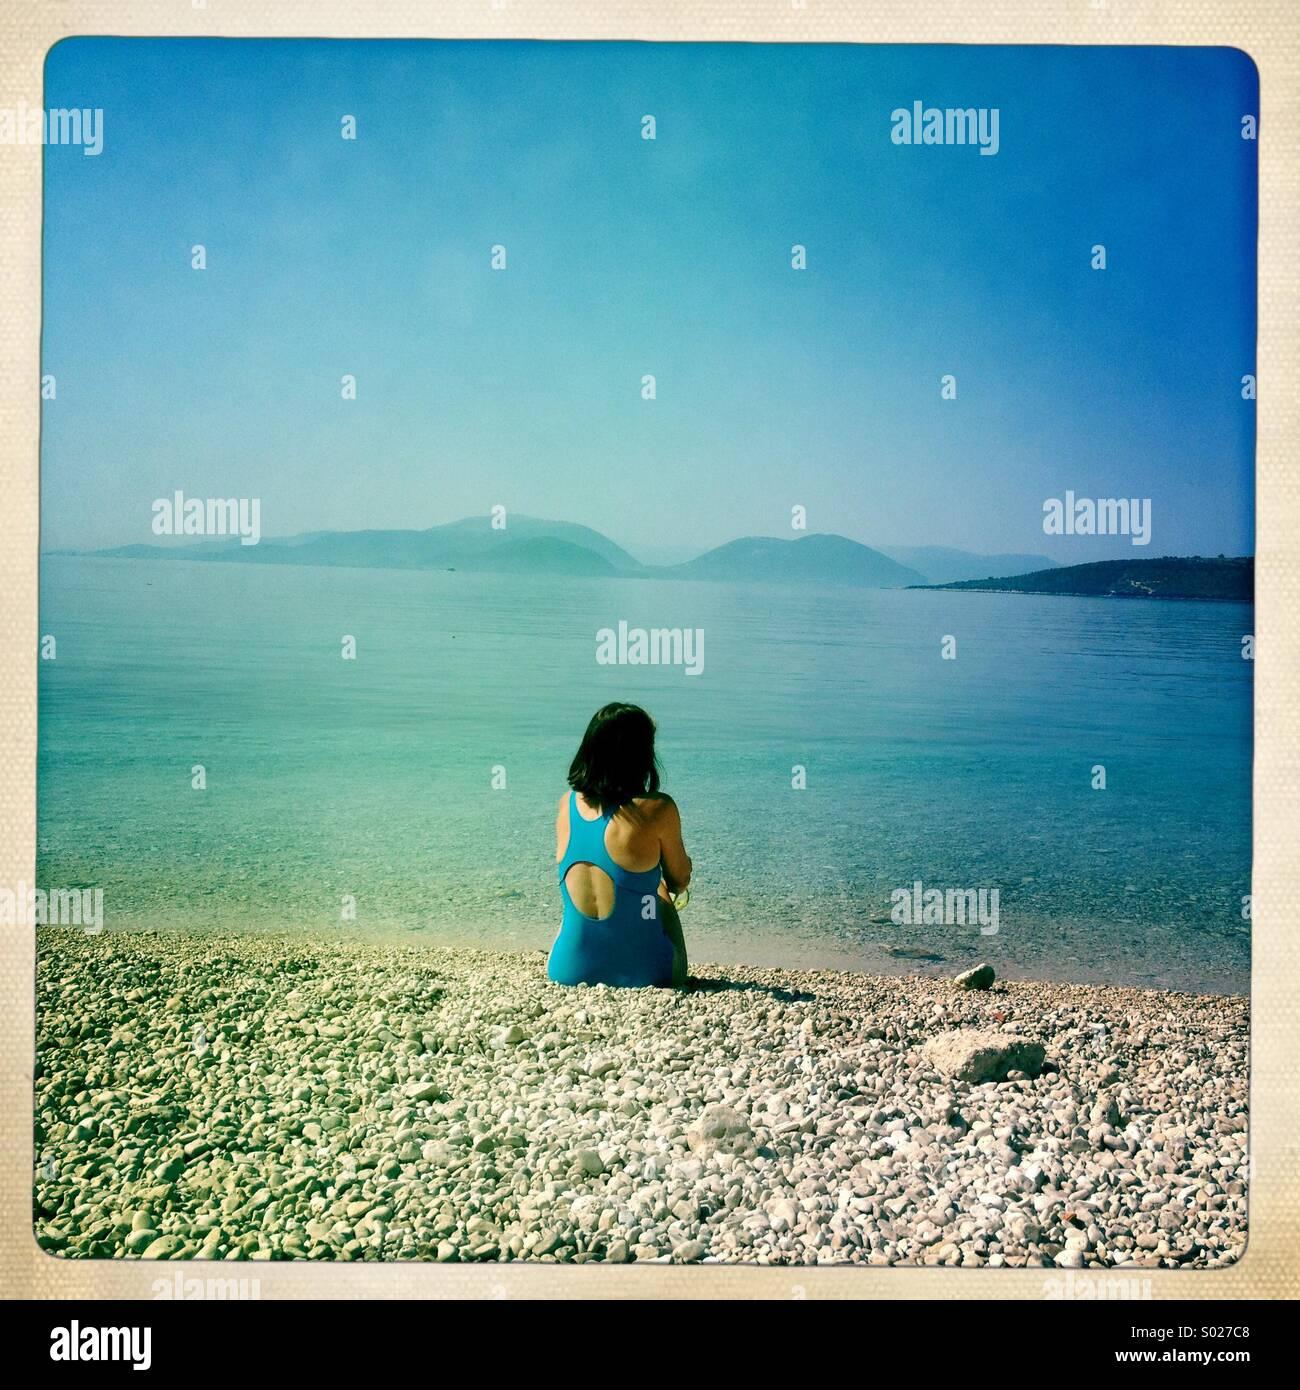 Woman alone on beach, Lefkada, Greece - Stock Image